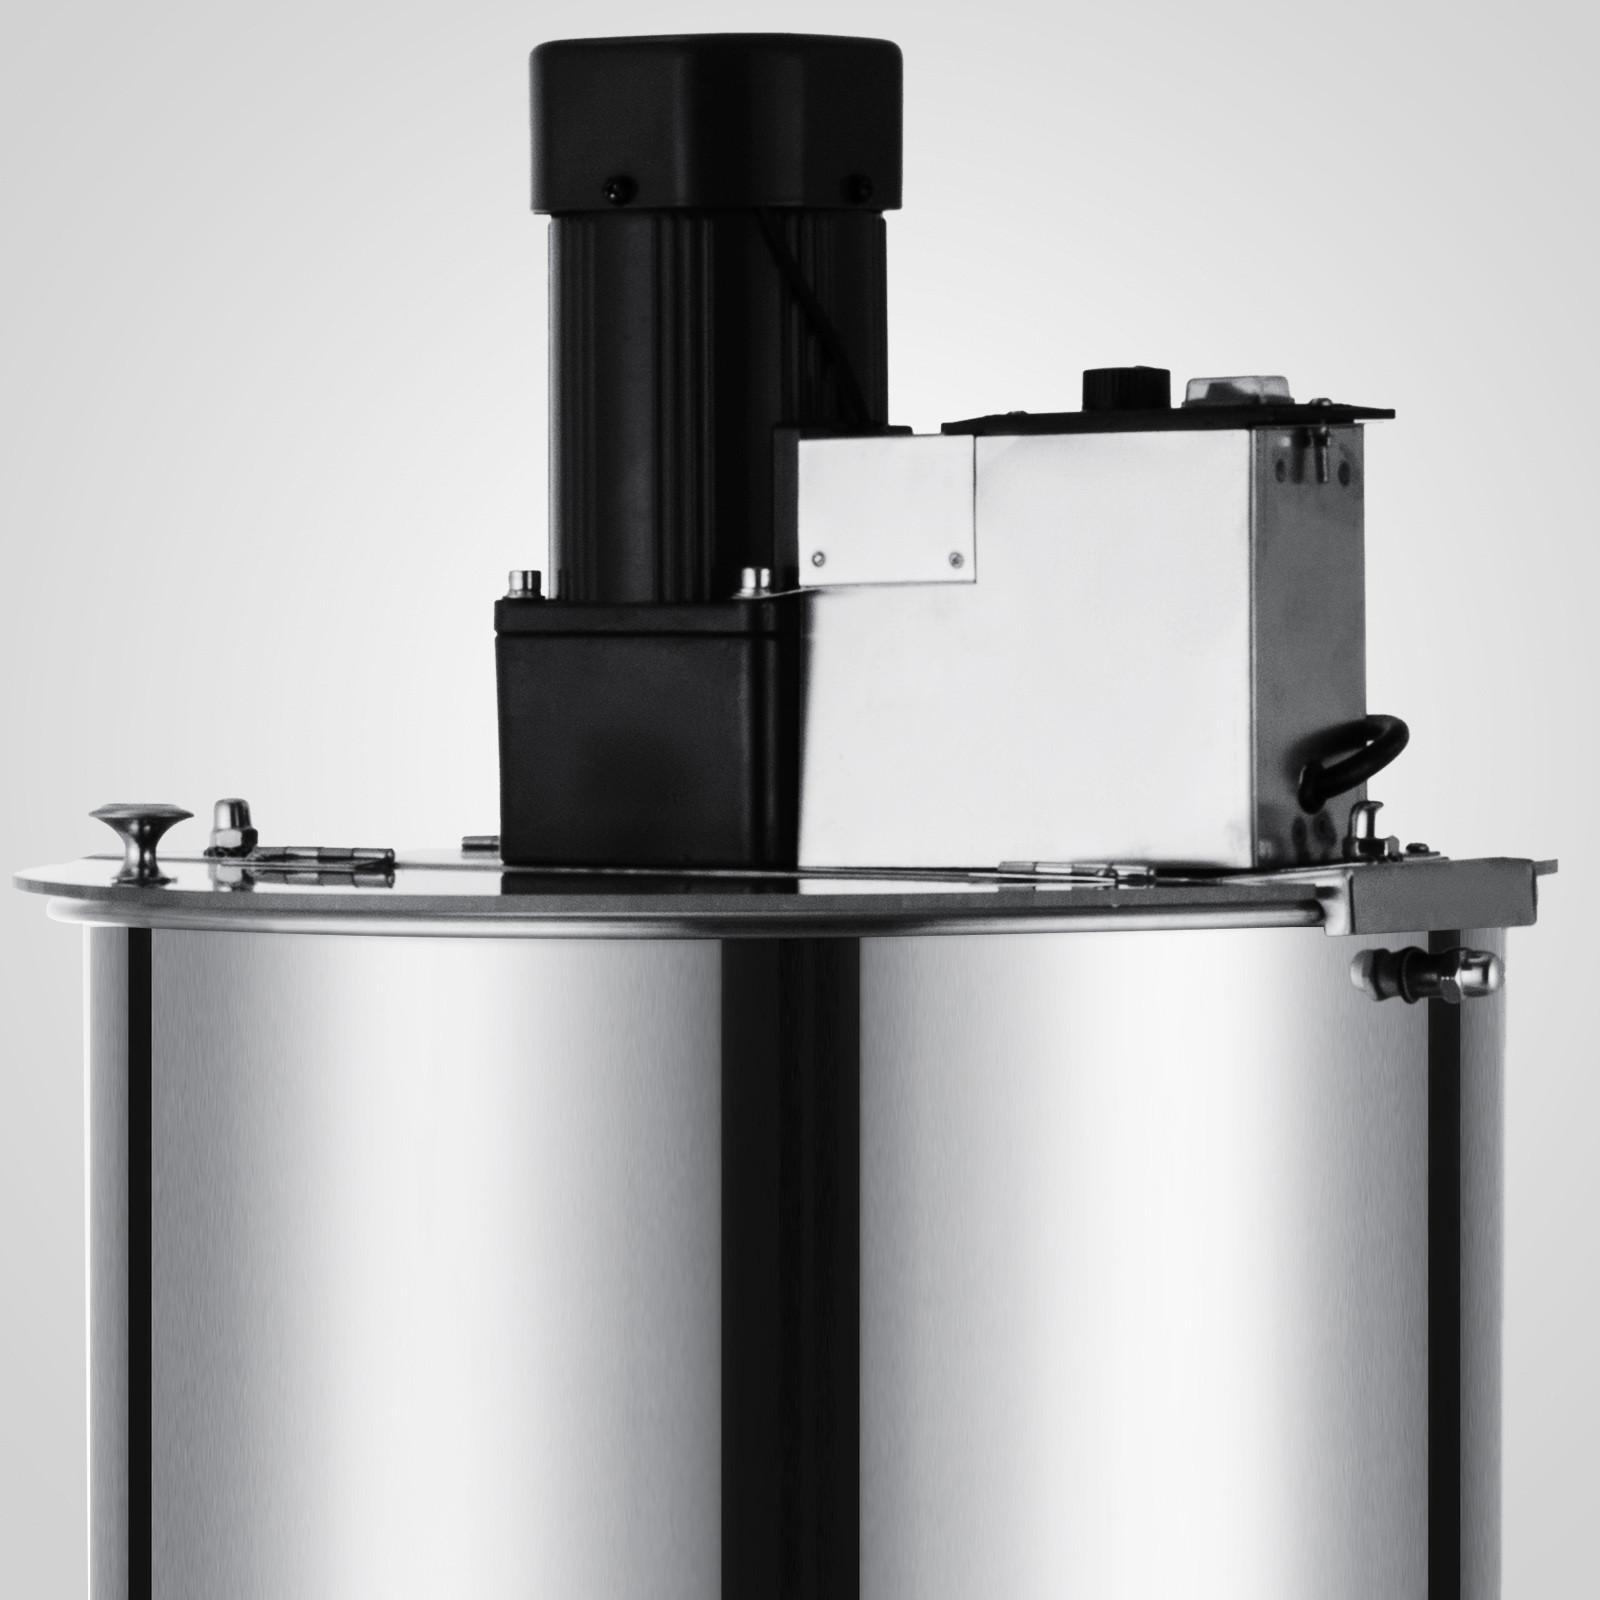 Extracteur-de-Miel-Electrique-manuelle-2-3-4-Cadres-En-Acier-Inox-Centrifugeuse miniature 68